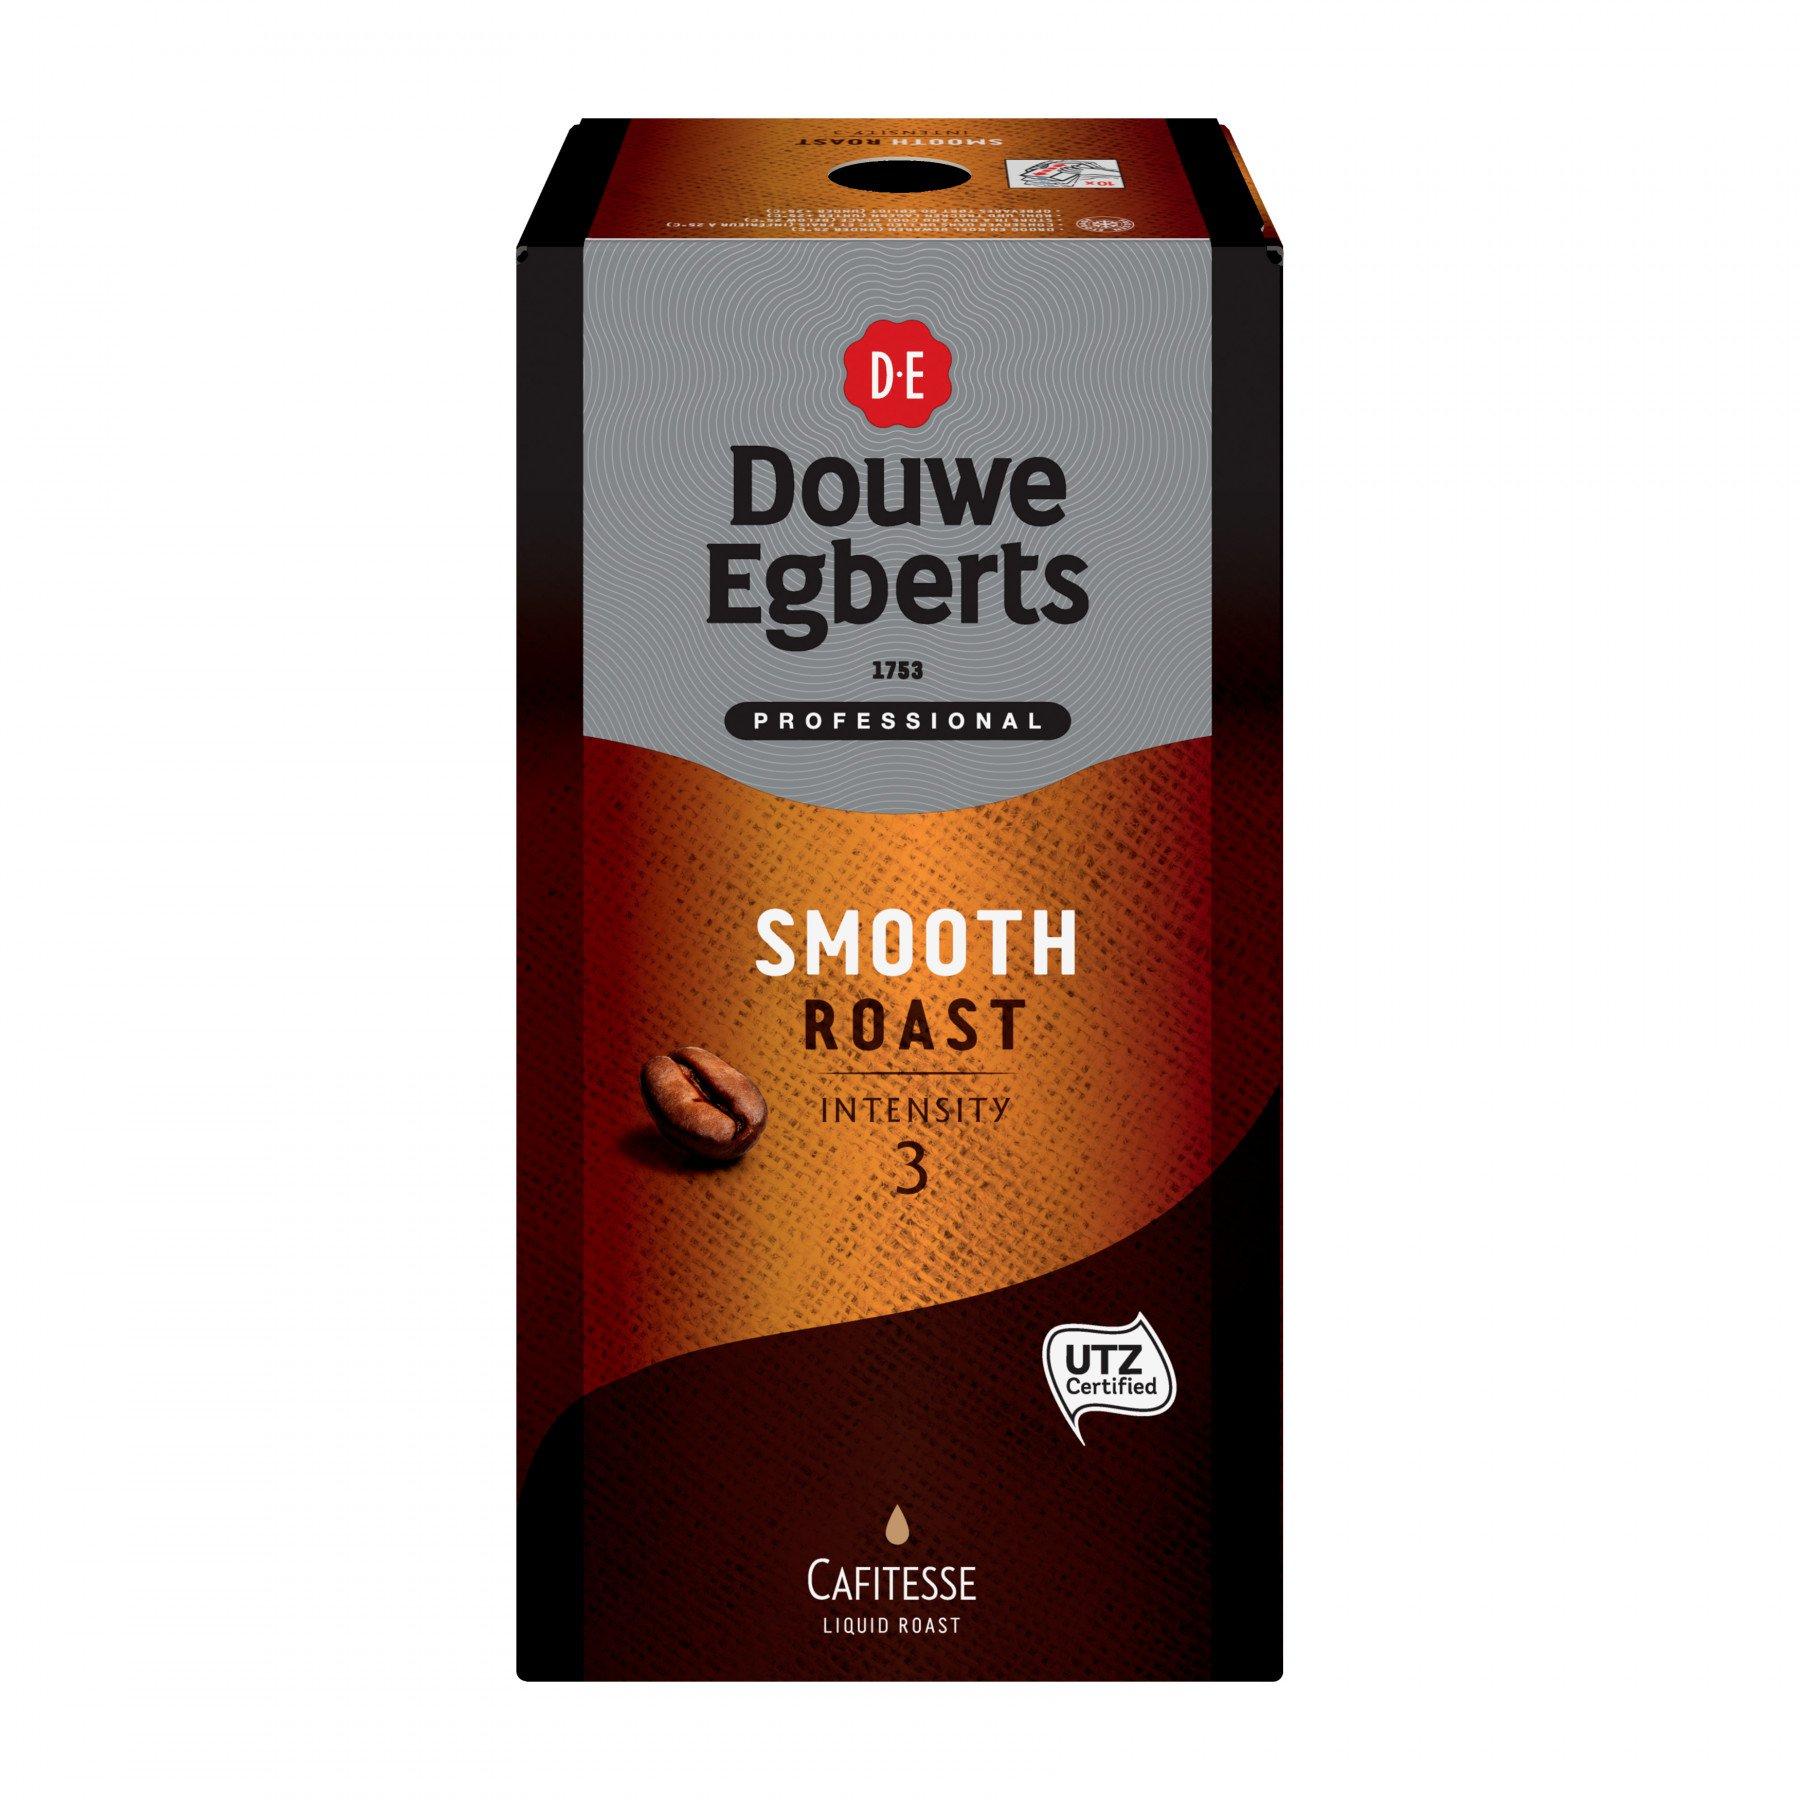 Douwe Egberts | Cafitesse Smooth Roast | 2 x 2 liter